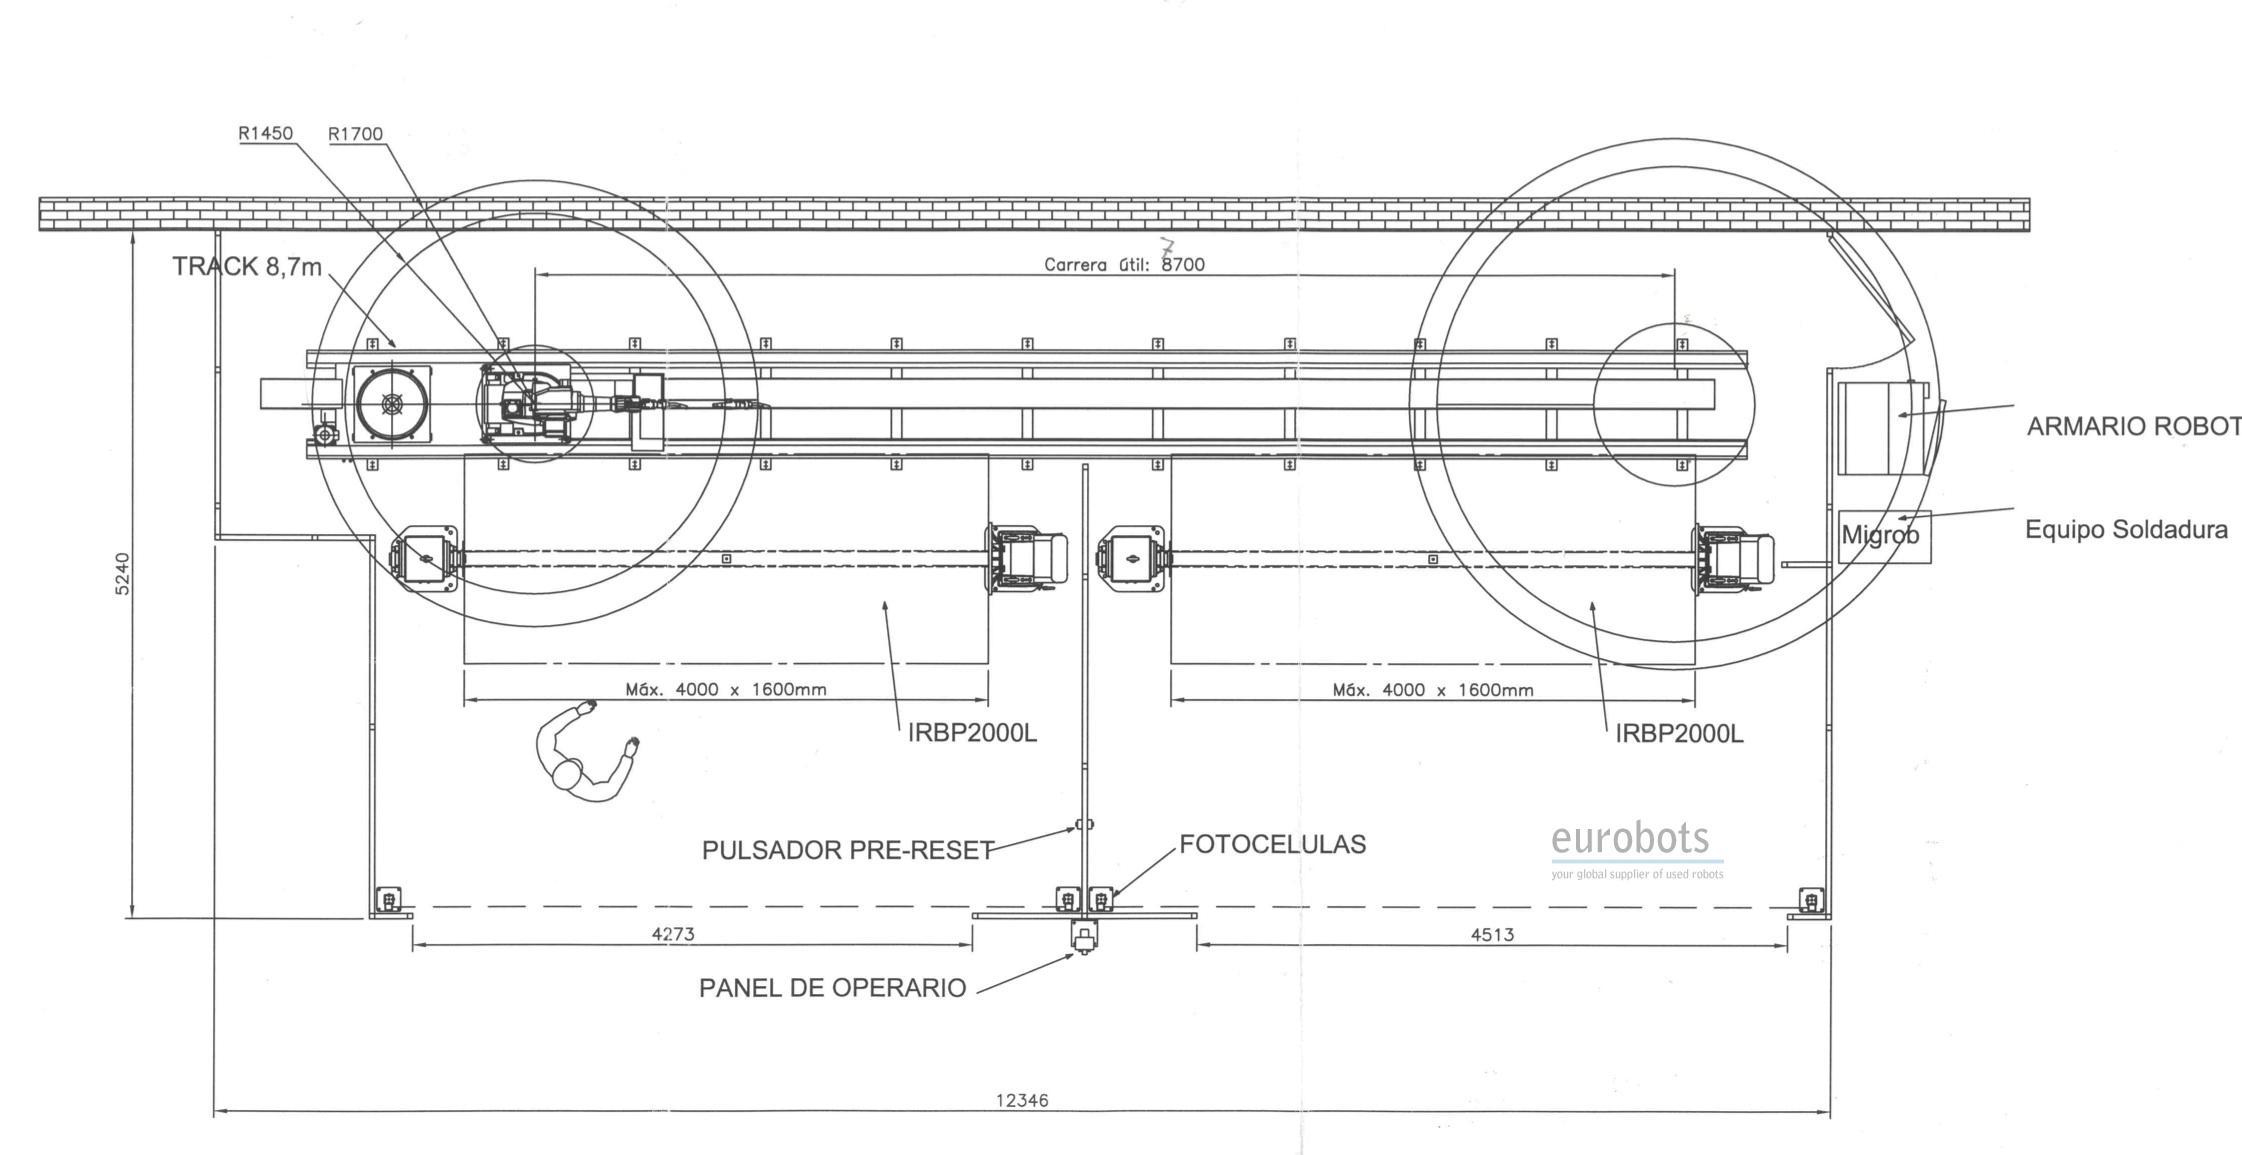 Abb Ach550 Wiring Diagrams Data Diagram Irc5 M2004 29 Images Drive Vfd